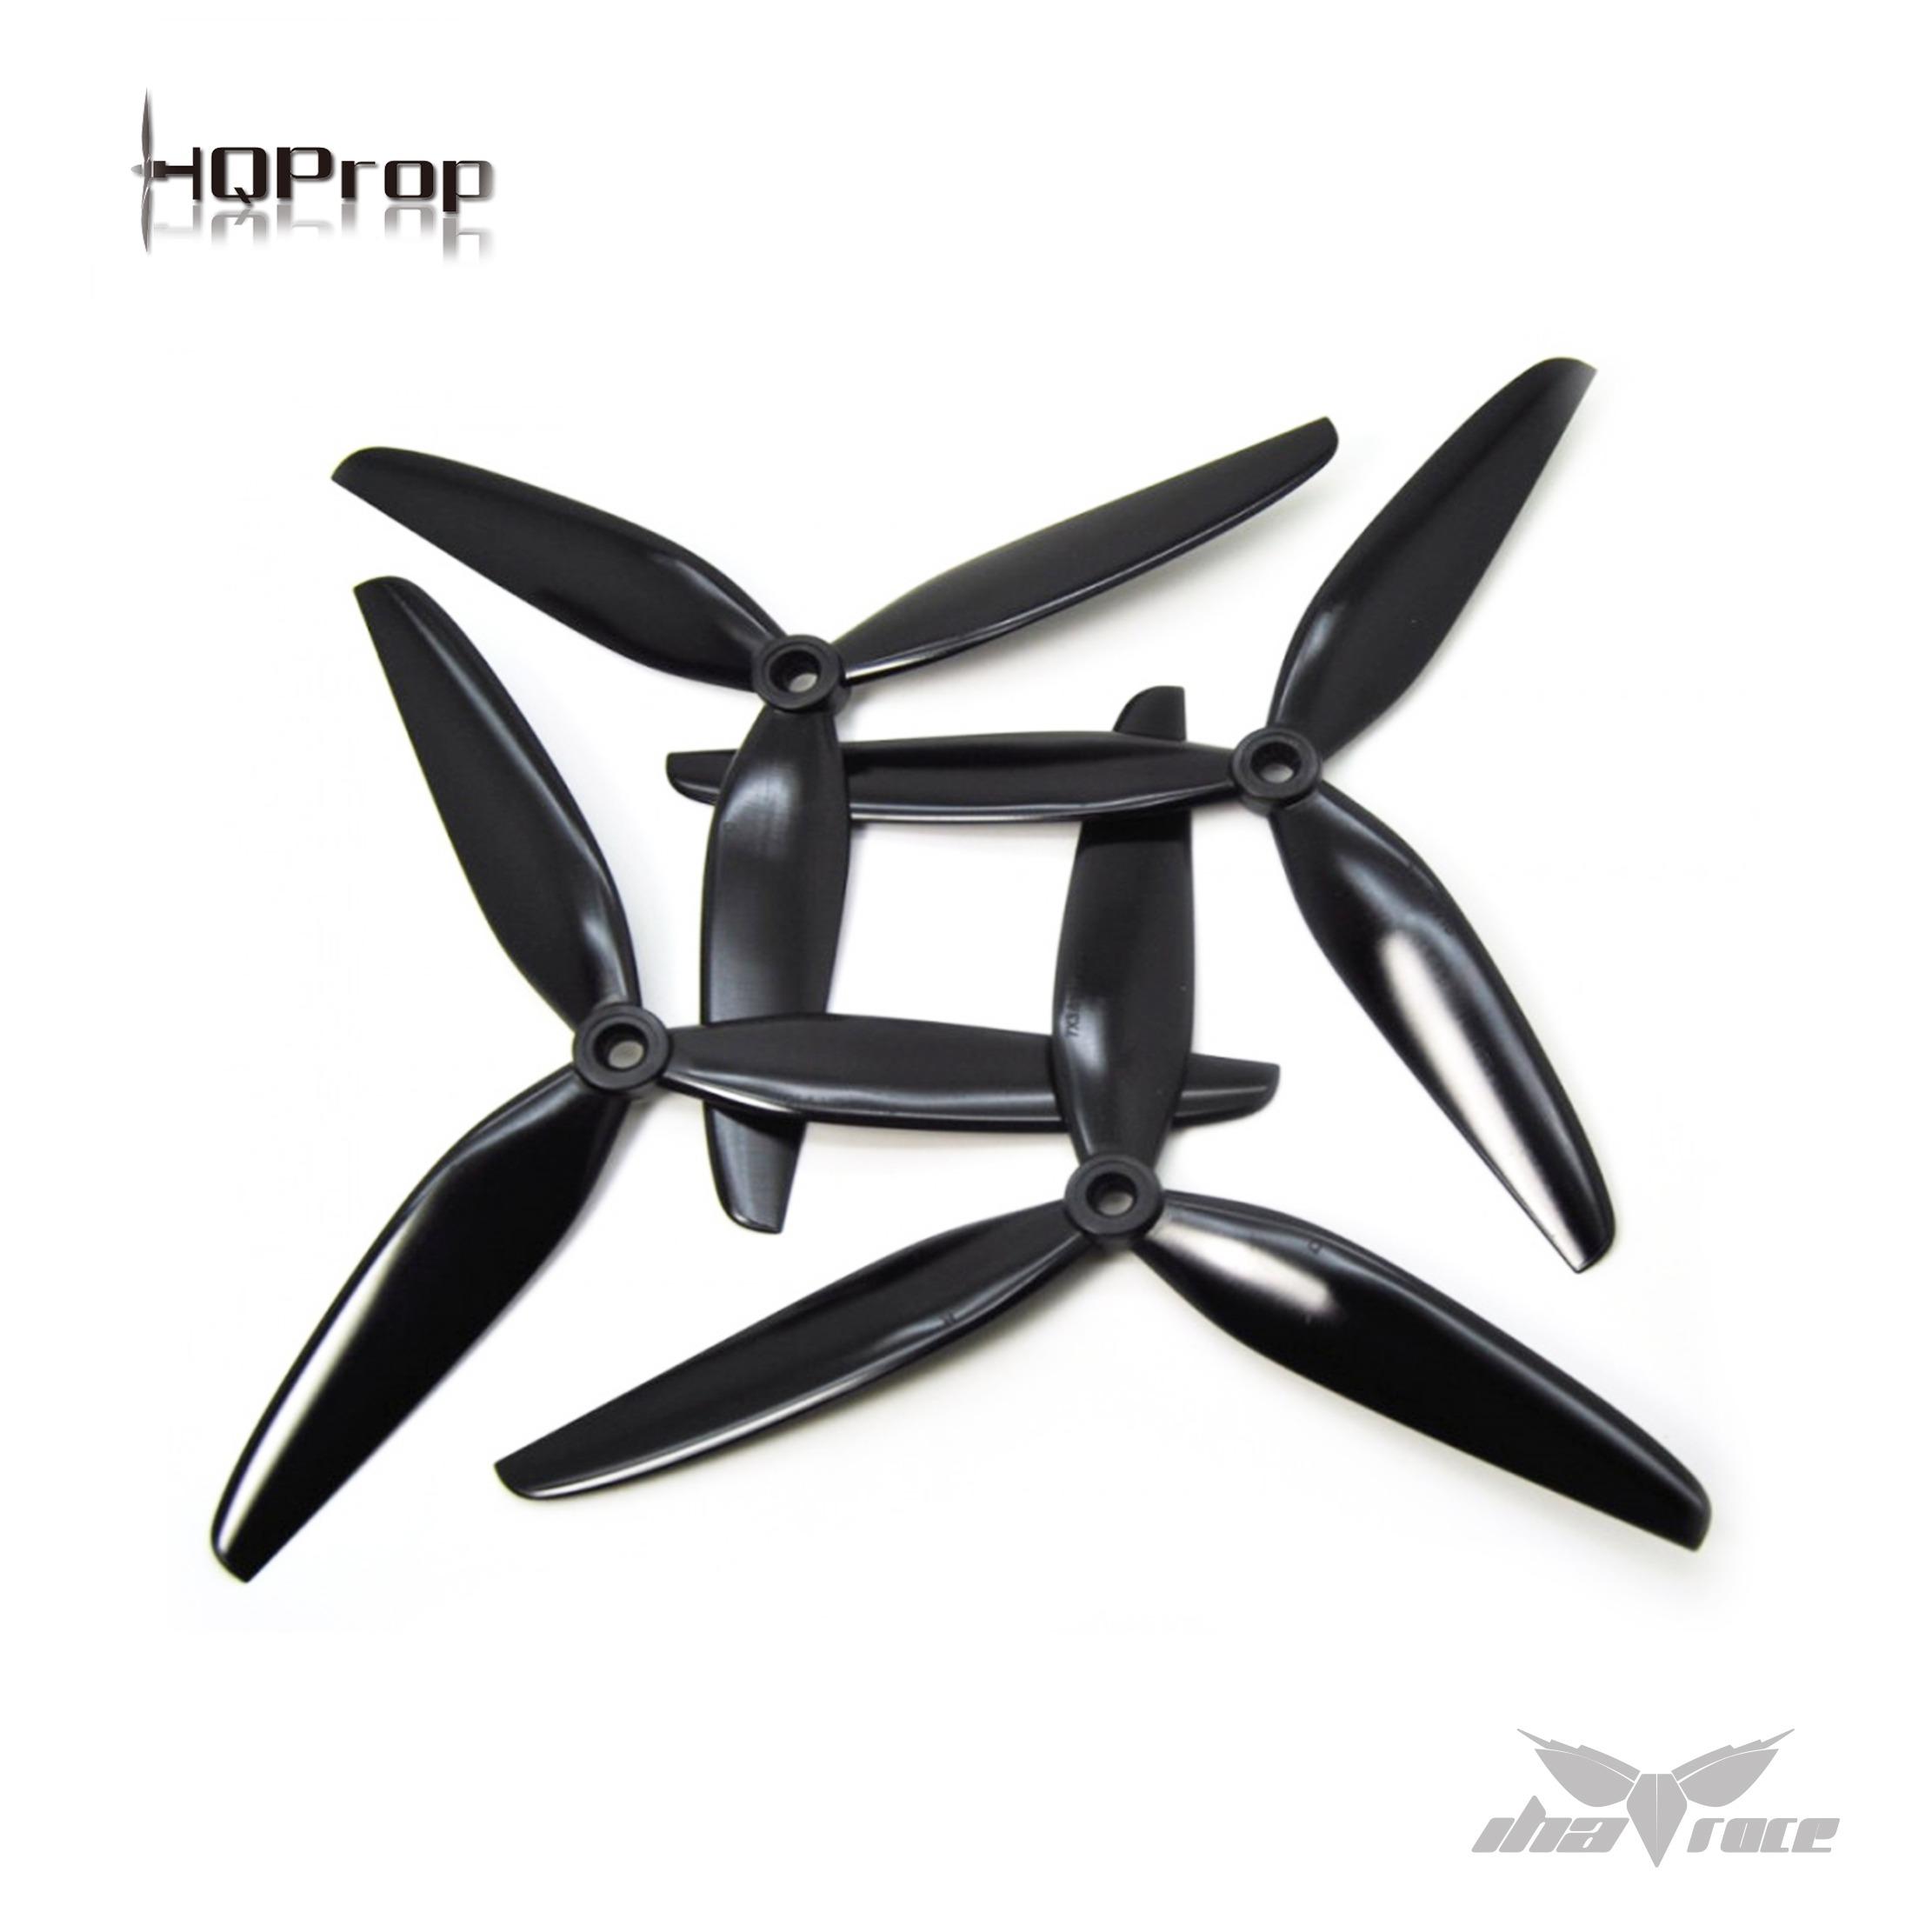 Hélices HQ Durable Prop 7X3.5X3V1S